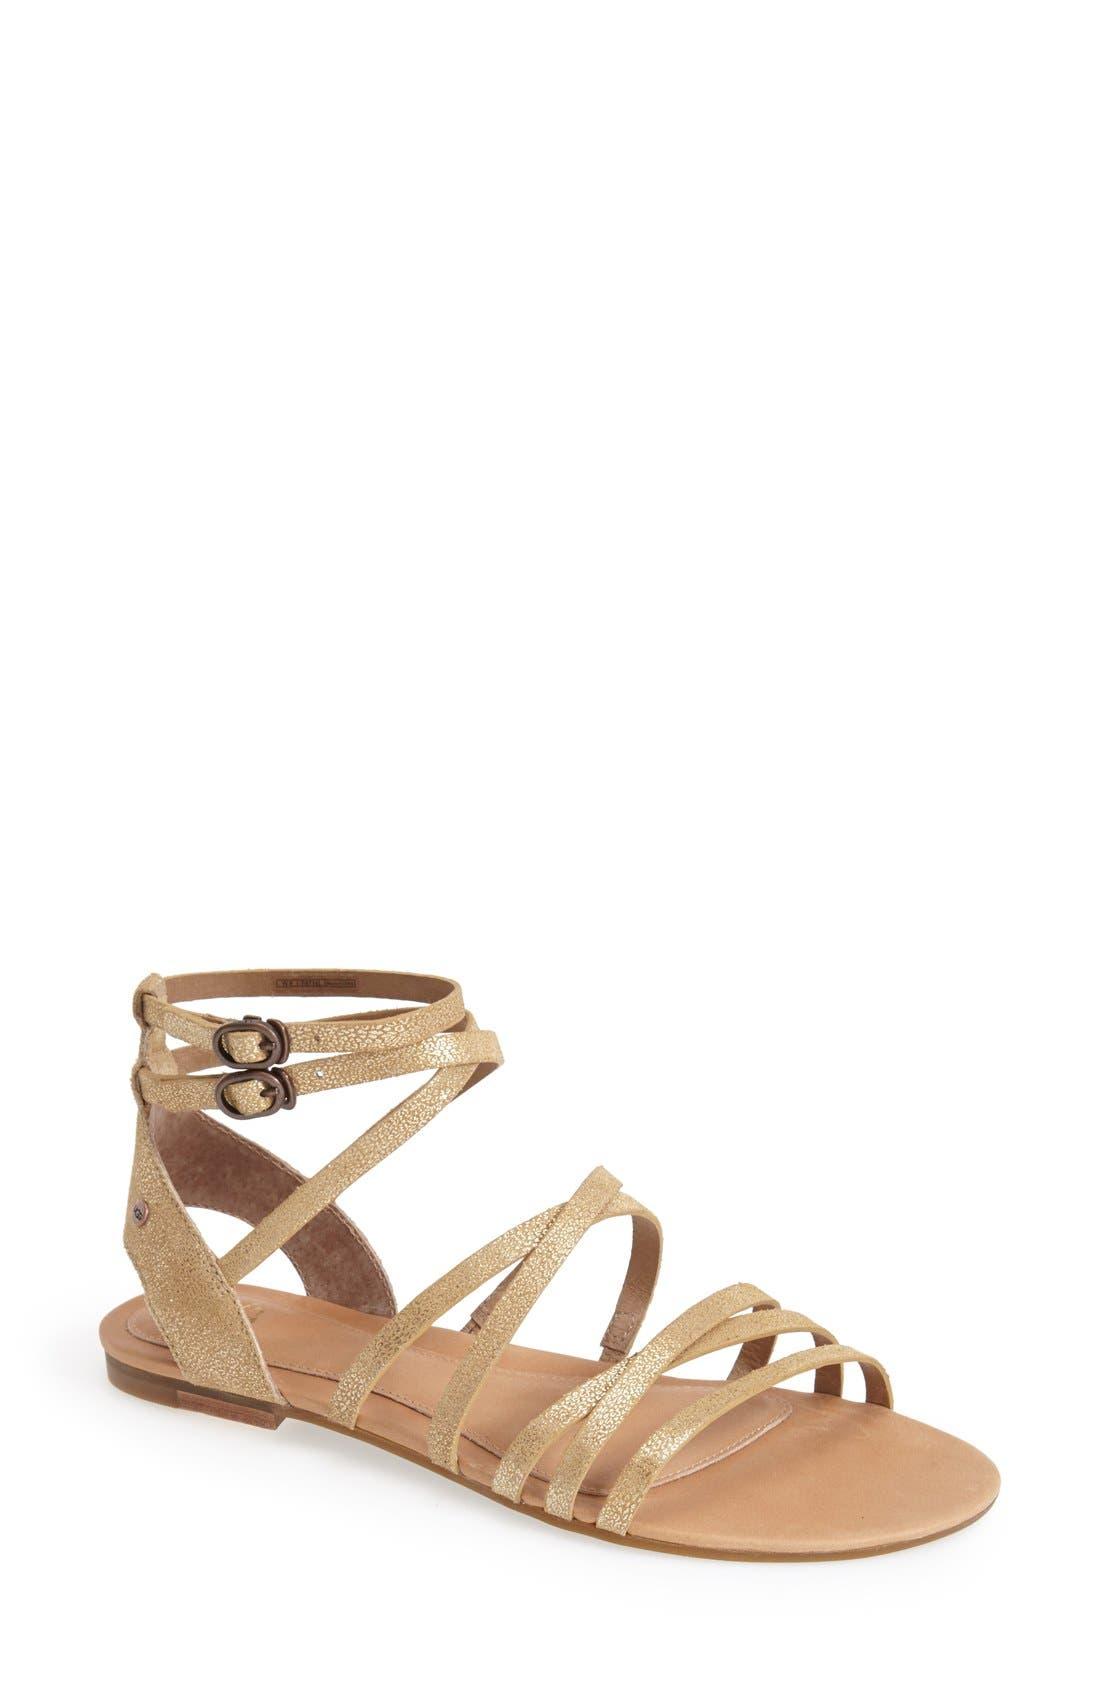 Main Image - UGG® Australia 'Devie' Metallic Leather Sandal (Women)